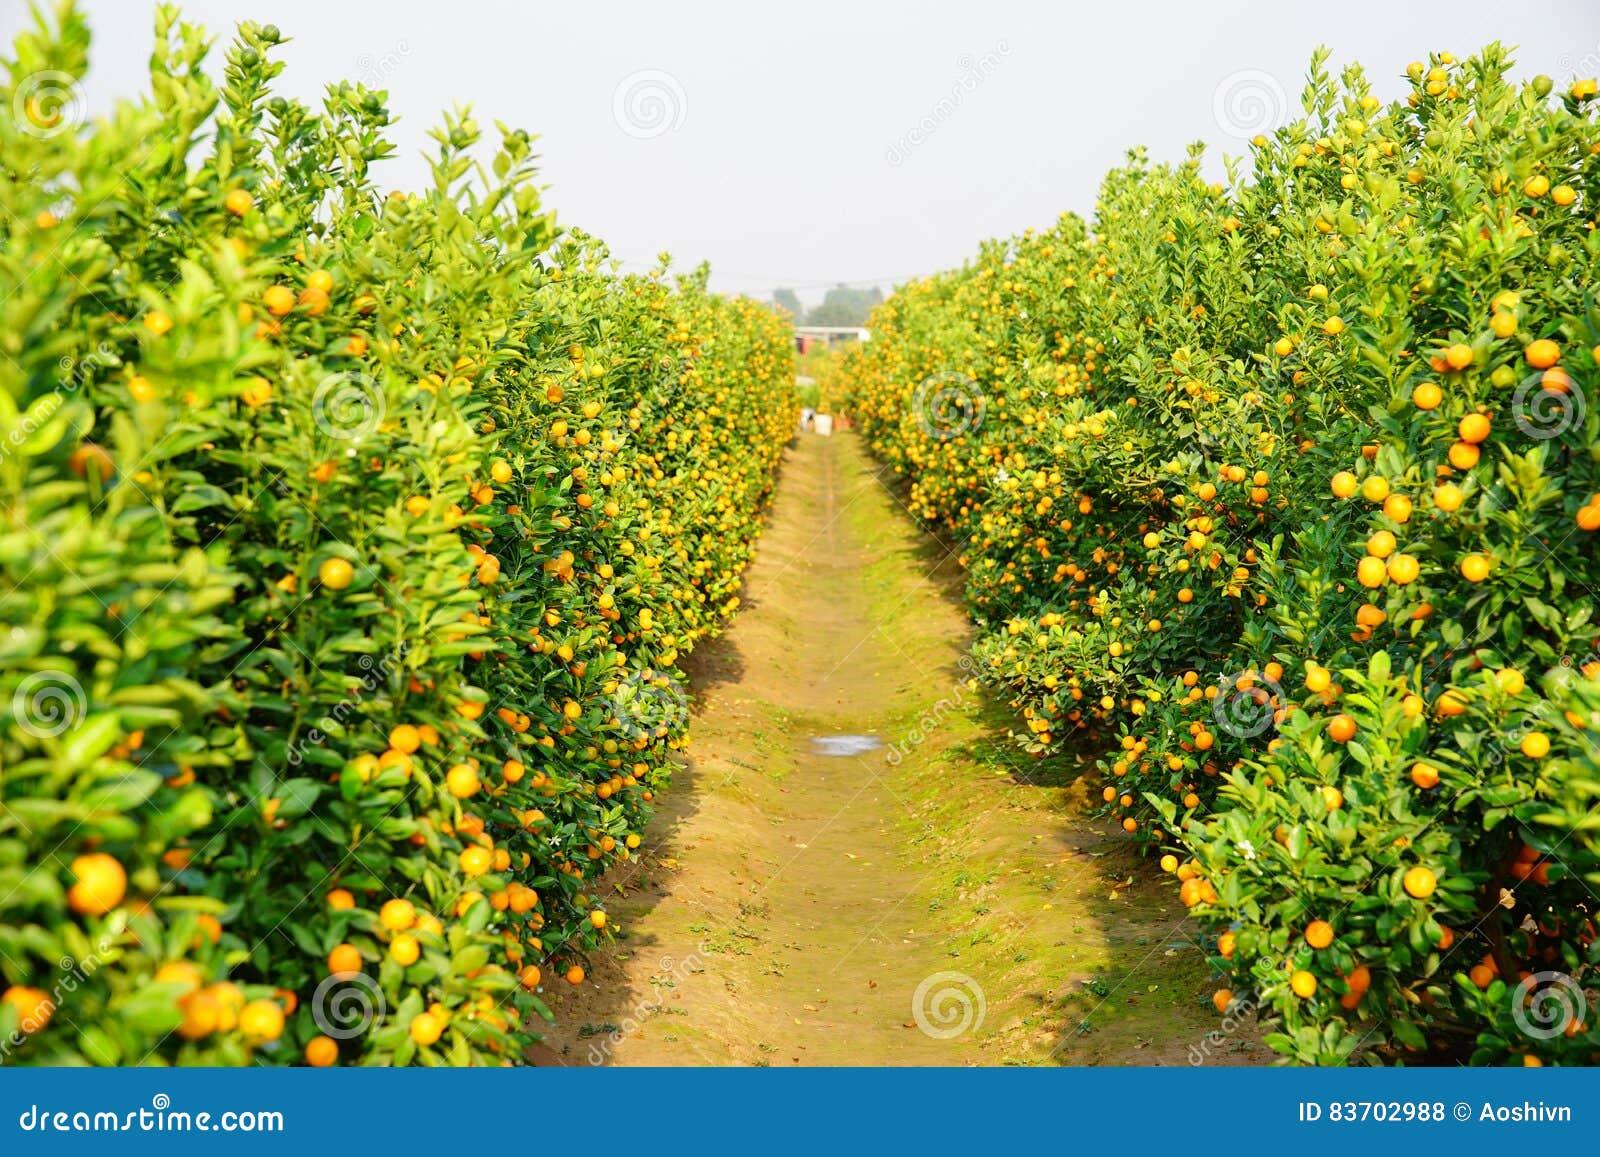 Growing Tangerines Stock Photo